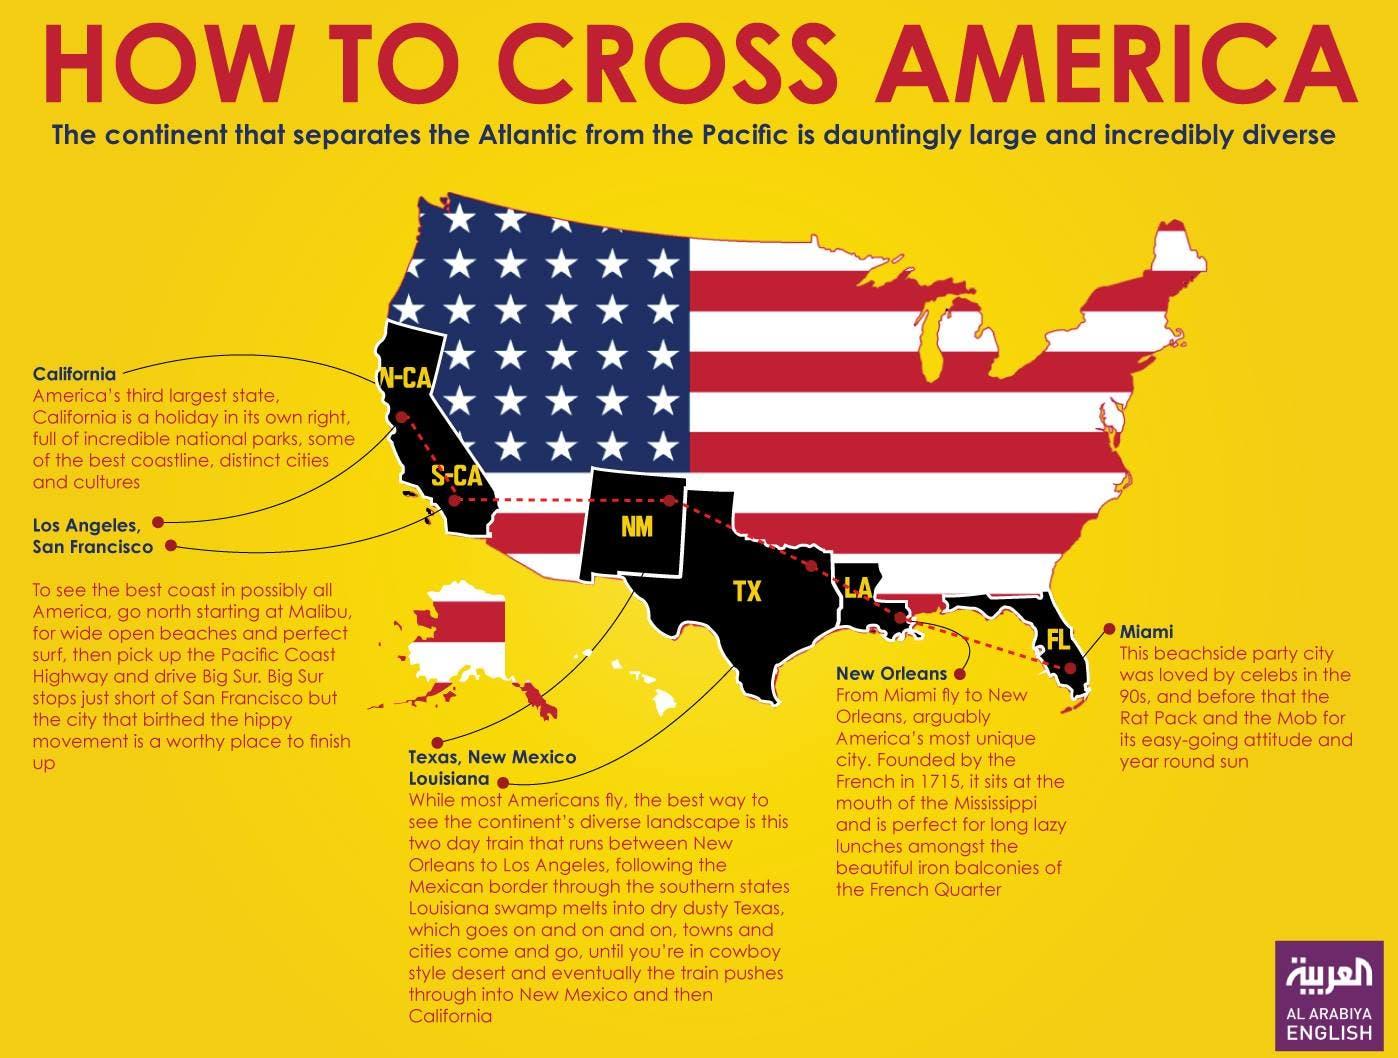 Infographic: How to cross America (Farwa Rizwan/ Al Arabiya English)